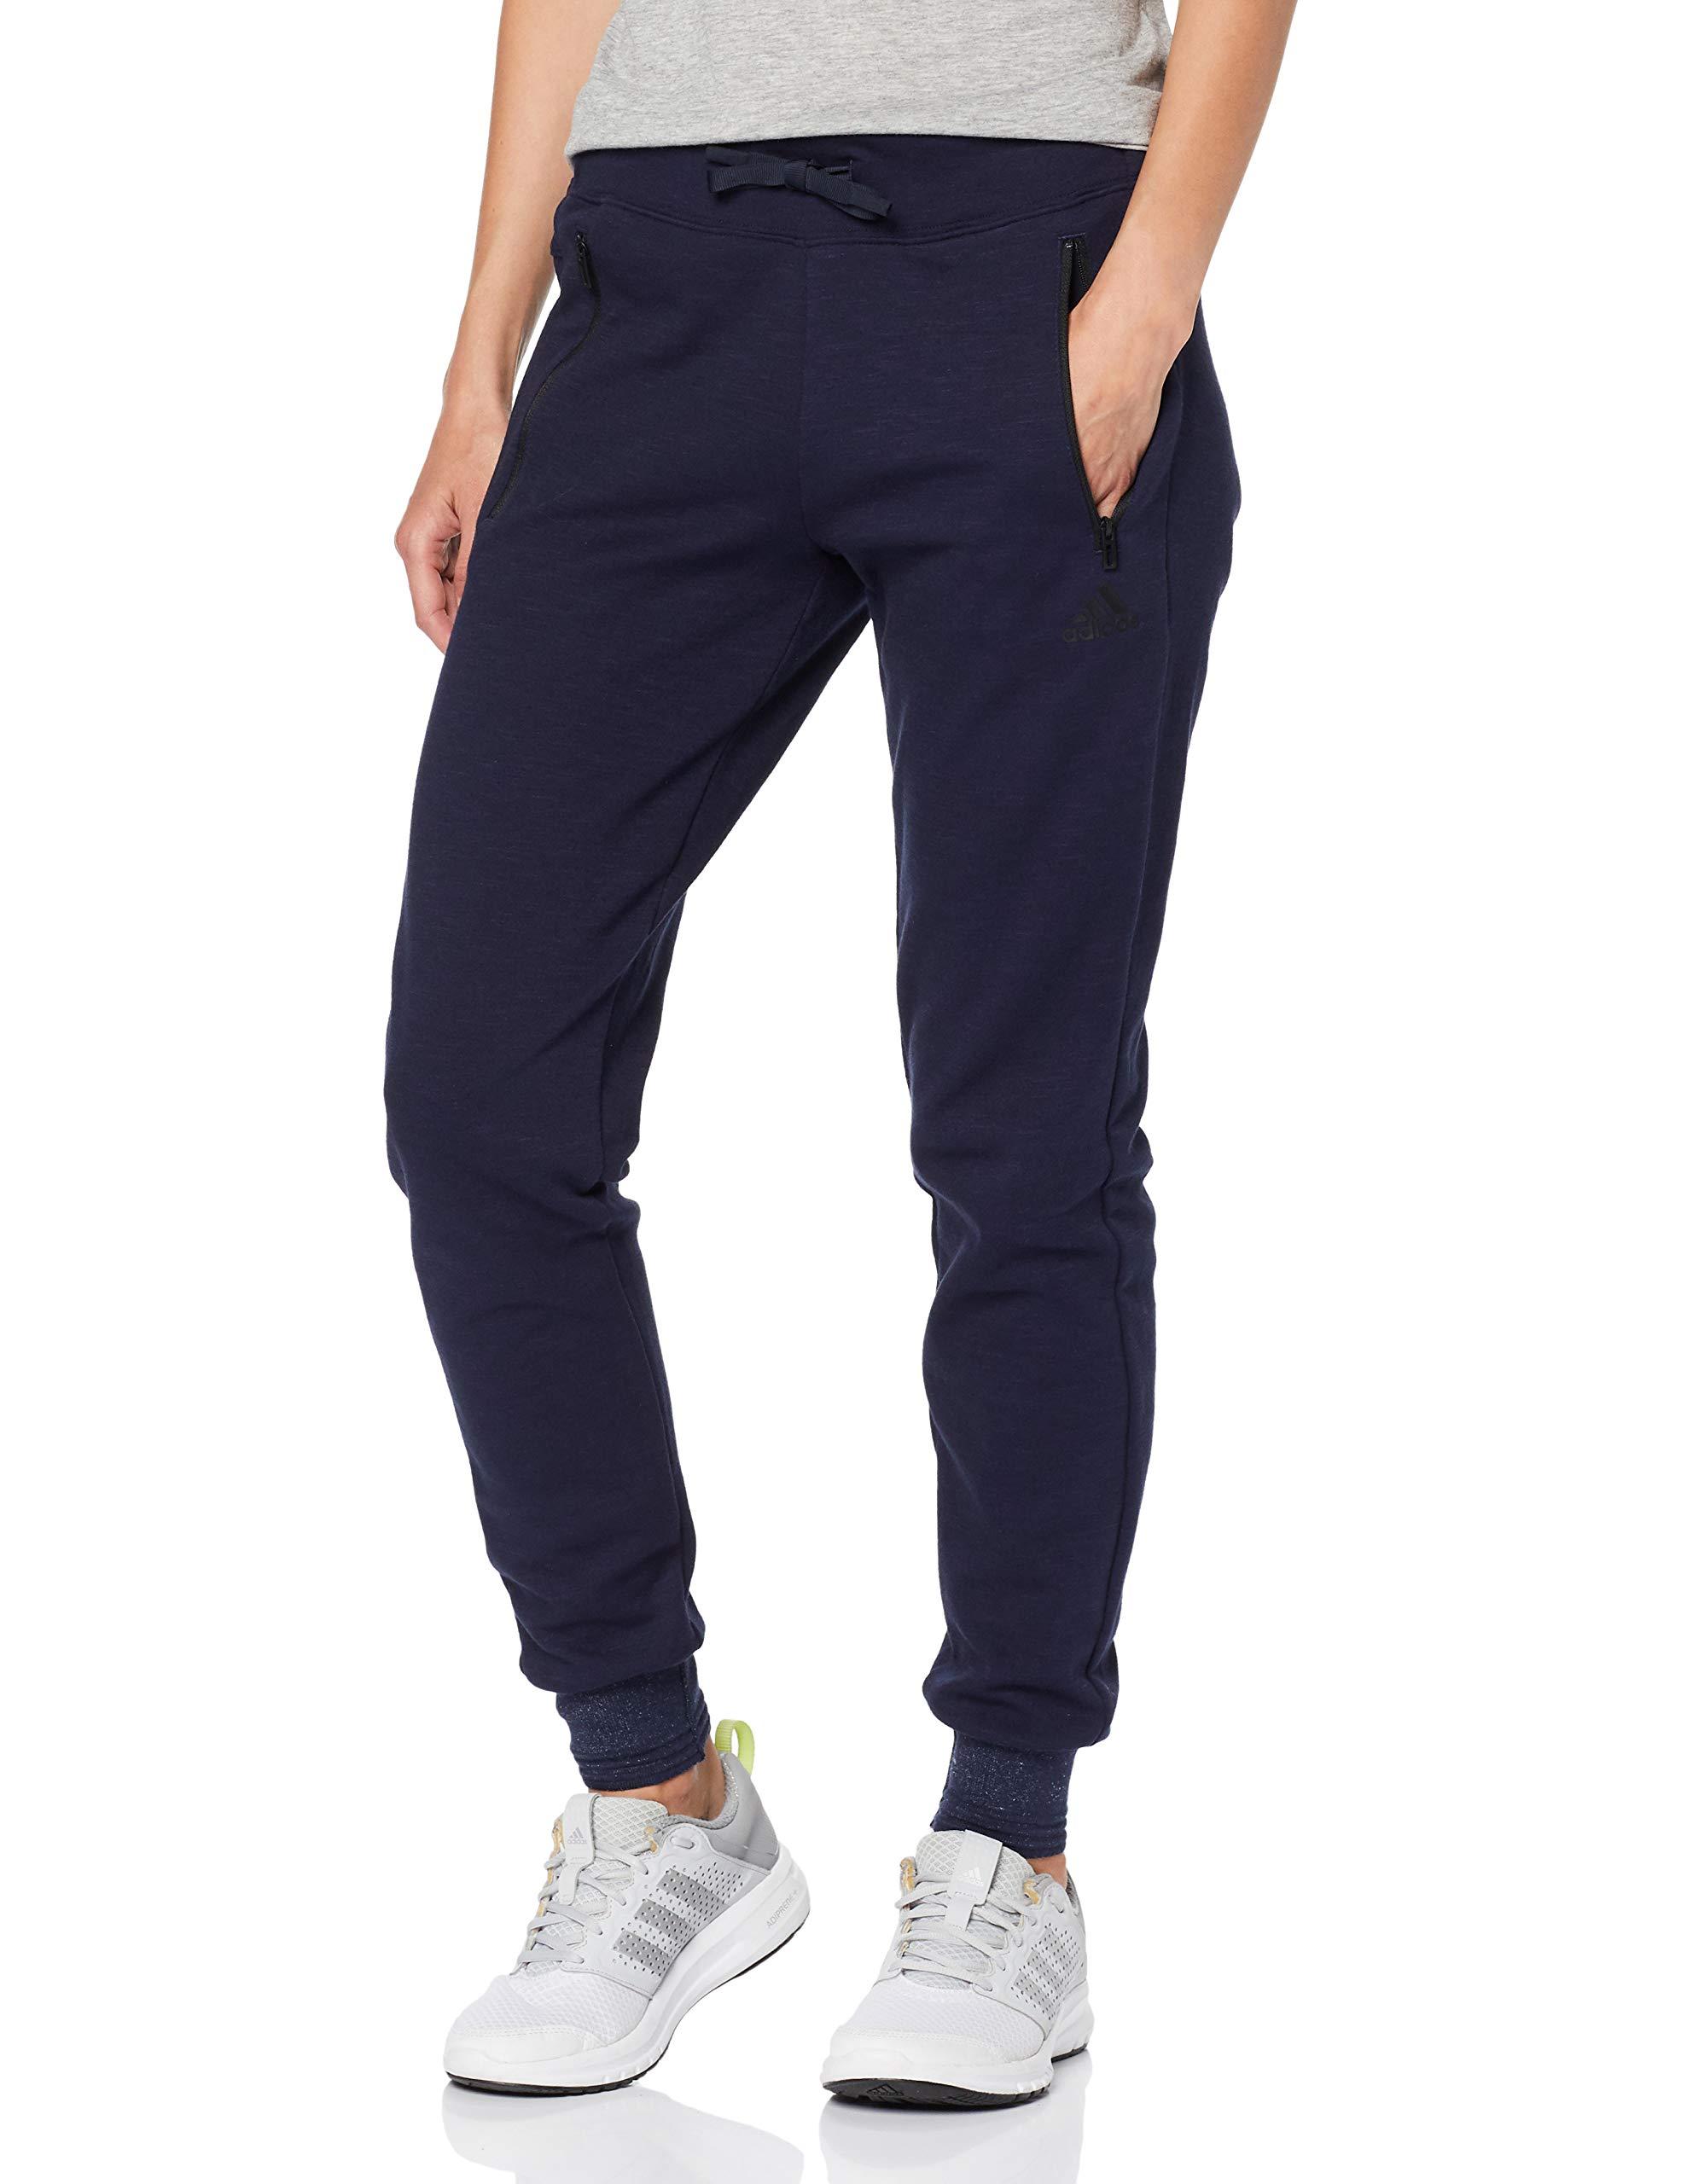 FemmesLeginkM Id Adidas pantalon Fitness Slim Ac3qS45RjL